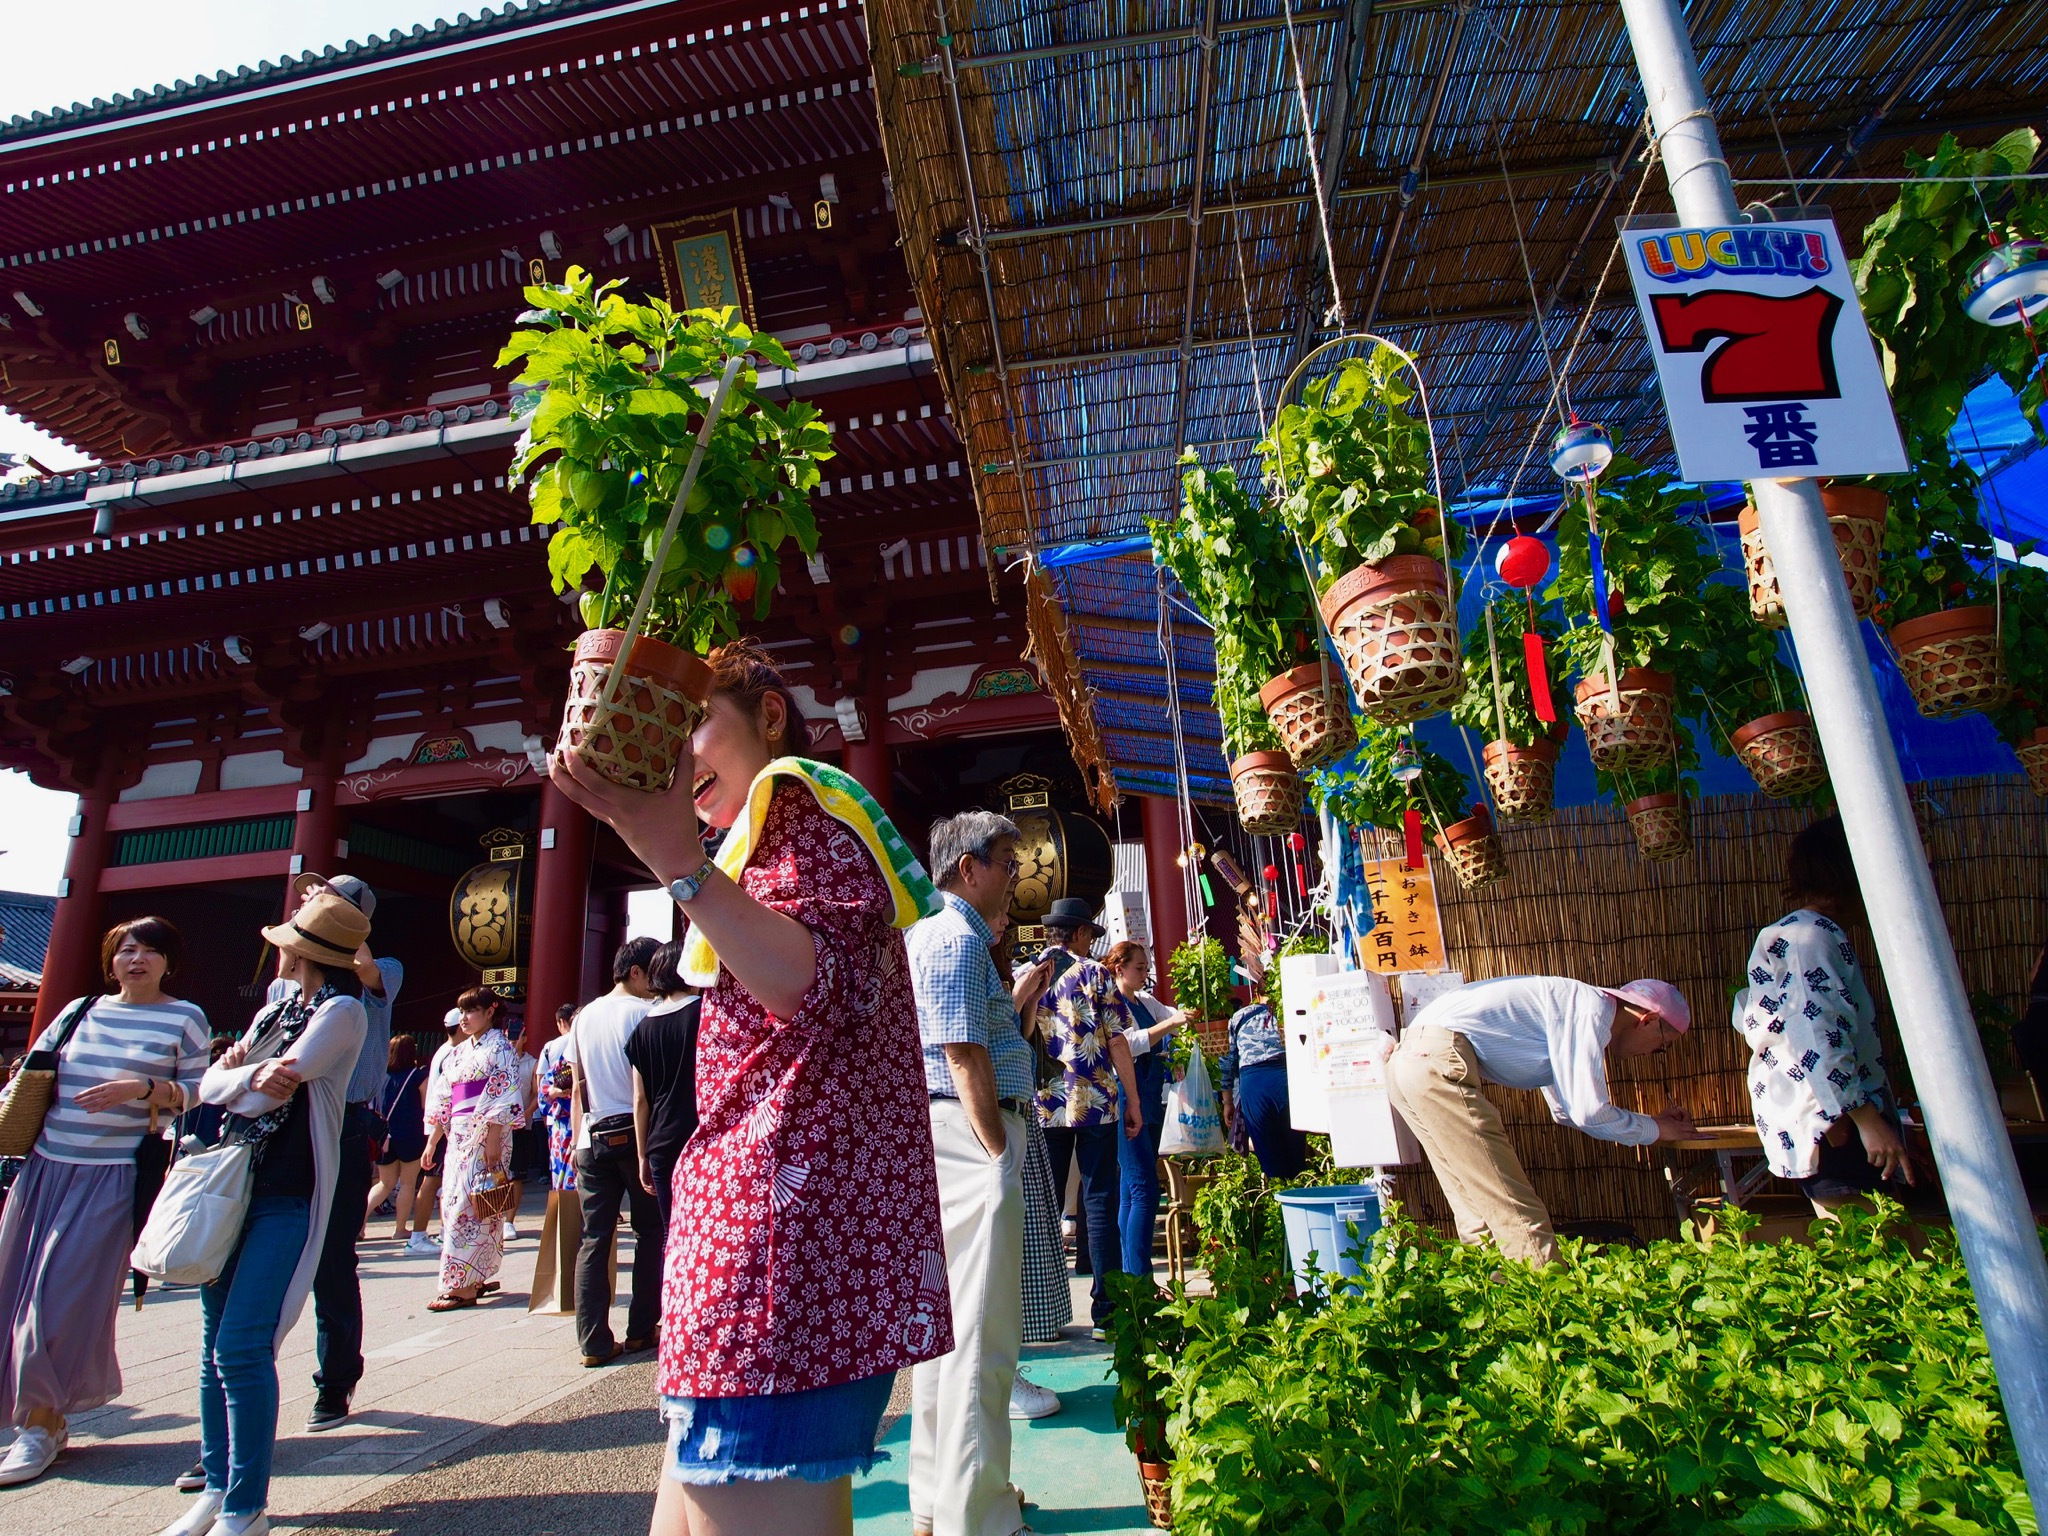 Chinese Lantern Plants market